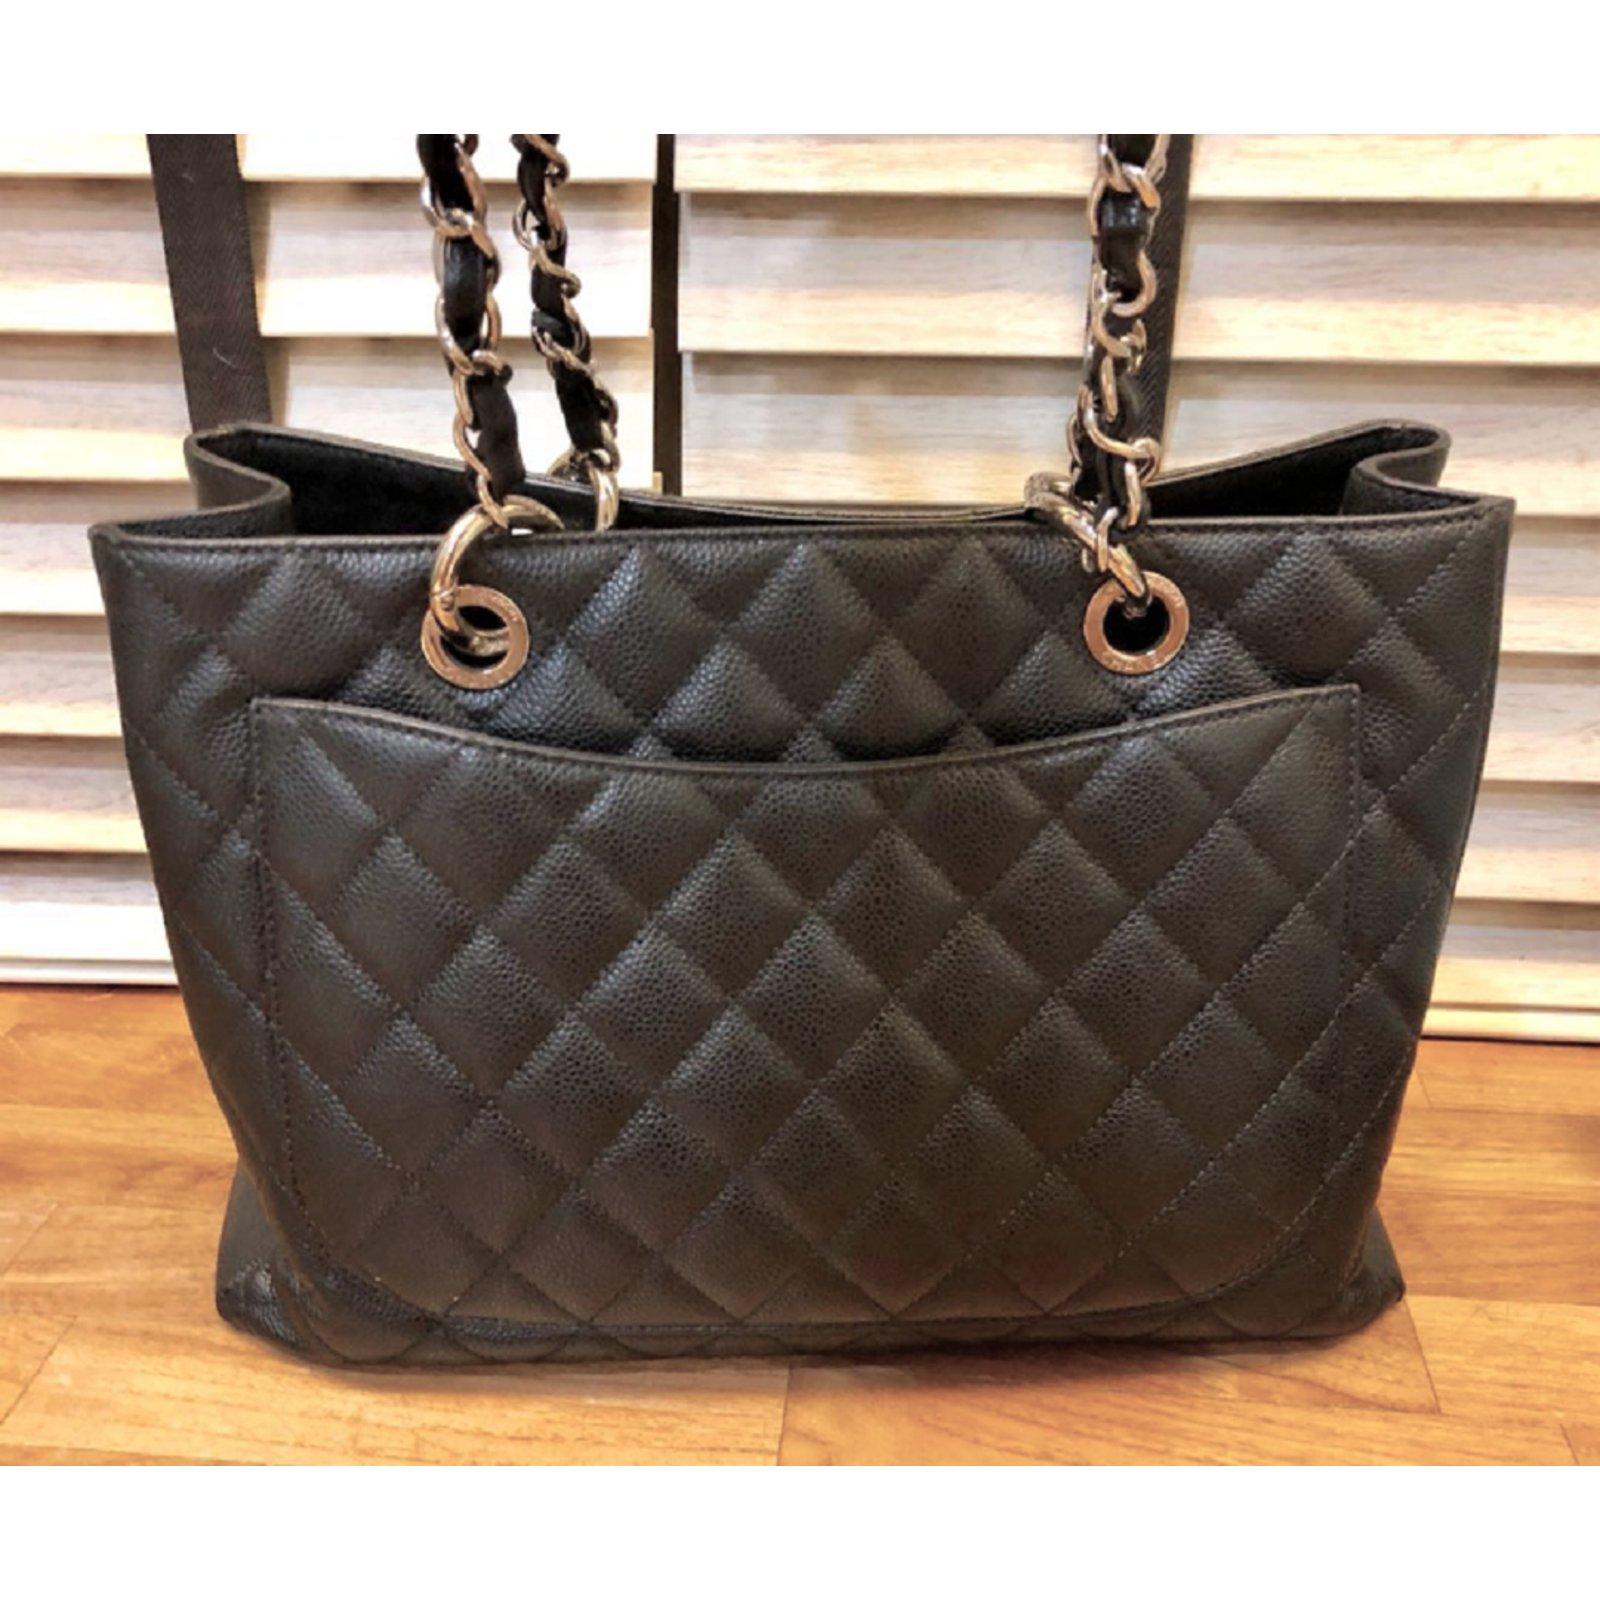 b35514126af7 Chanel GST tote bag Black Caviar Leather Totes Leather Black ref.79754 -  Joli Closet